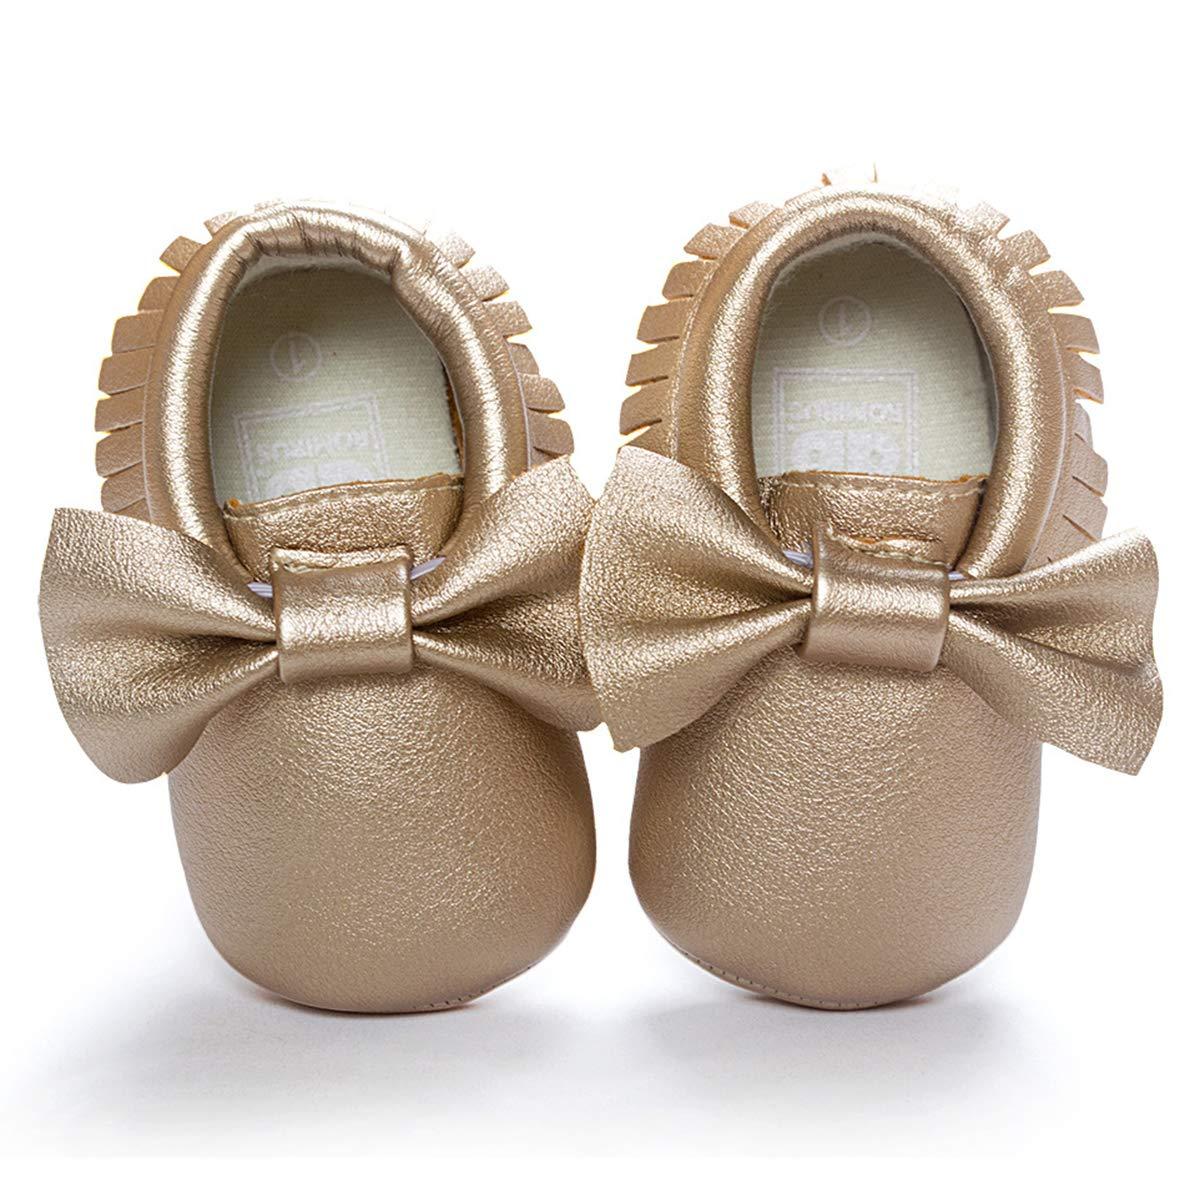 LIVEBOX Infant Baby Girls' Bow Mocassins Soft Sole Anti-Slip Tassels Prewalker Toddler Leather Crib Shoes£¨M:6-12 Months,Golden£